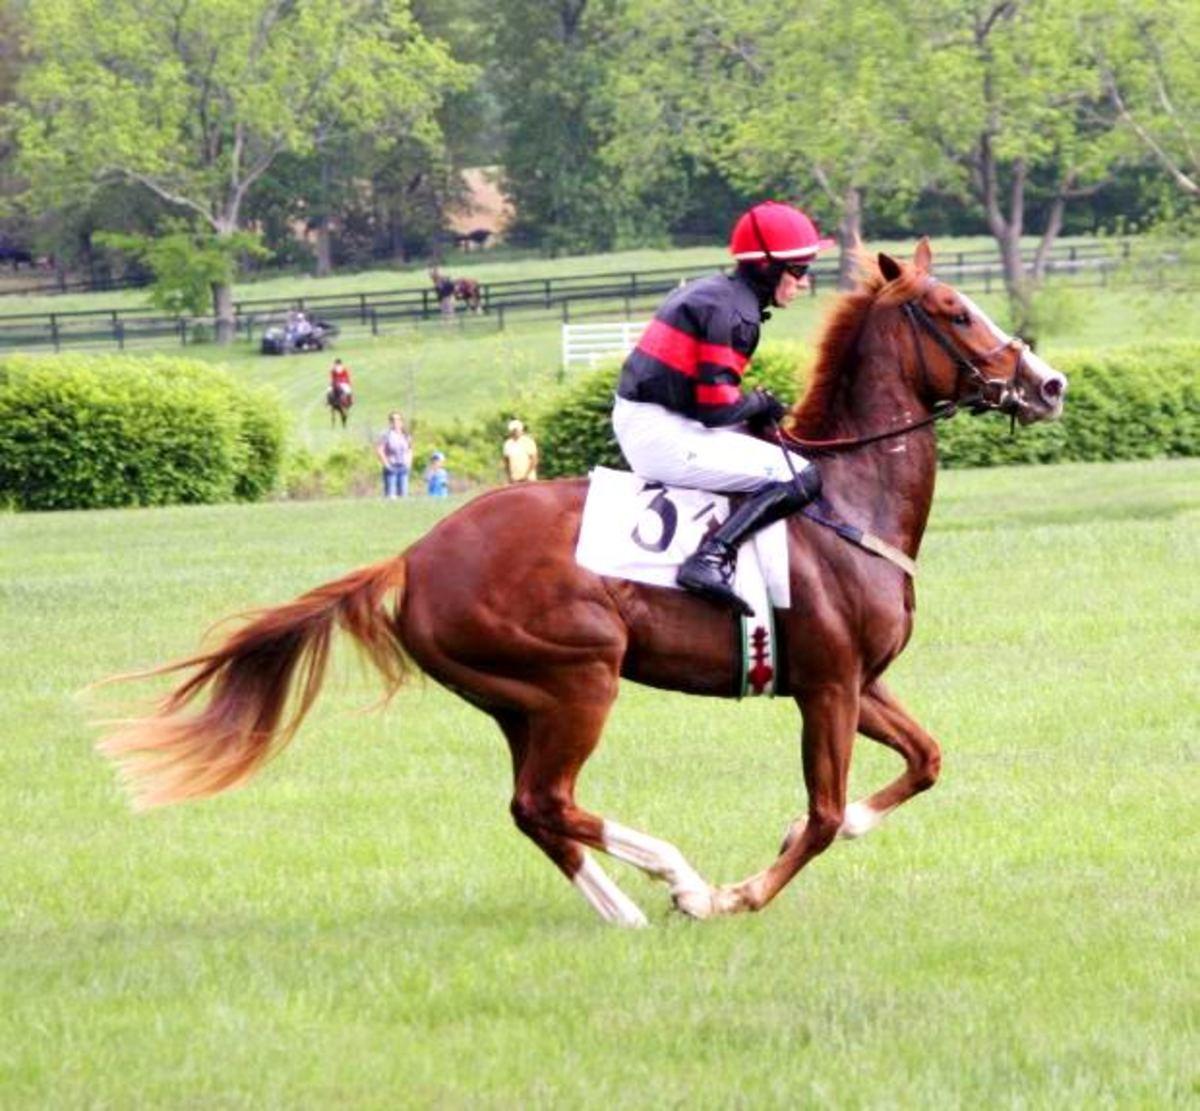 Horse Gallop Gallop Gait